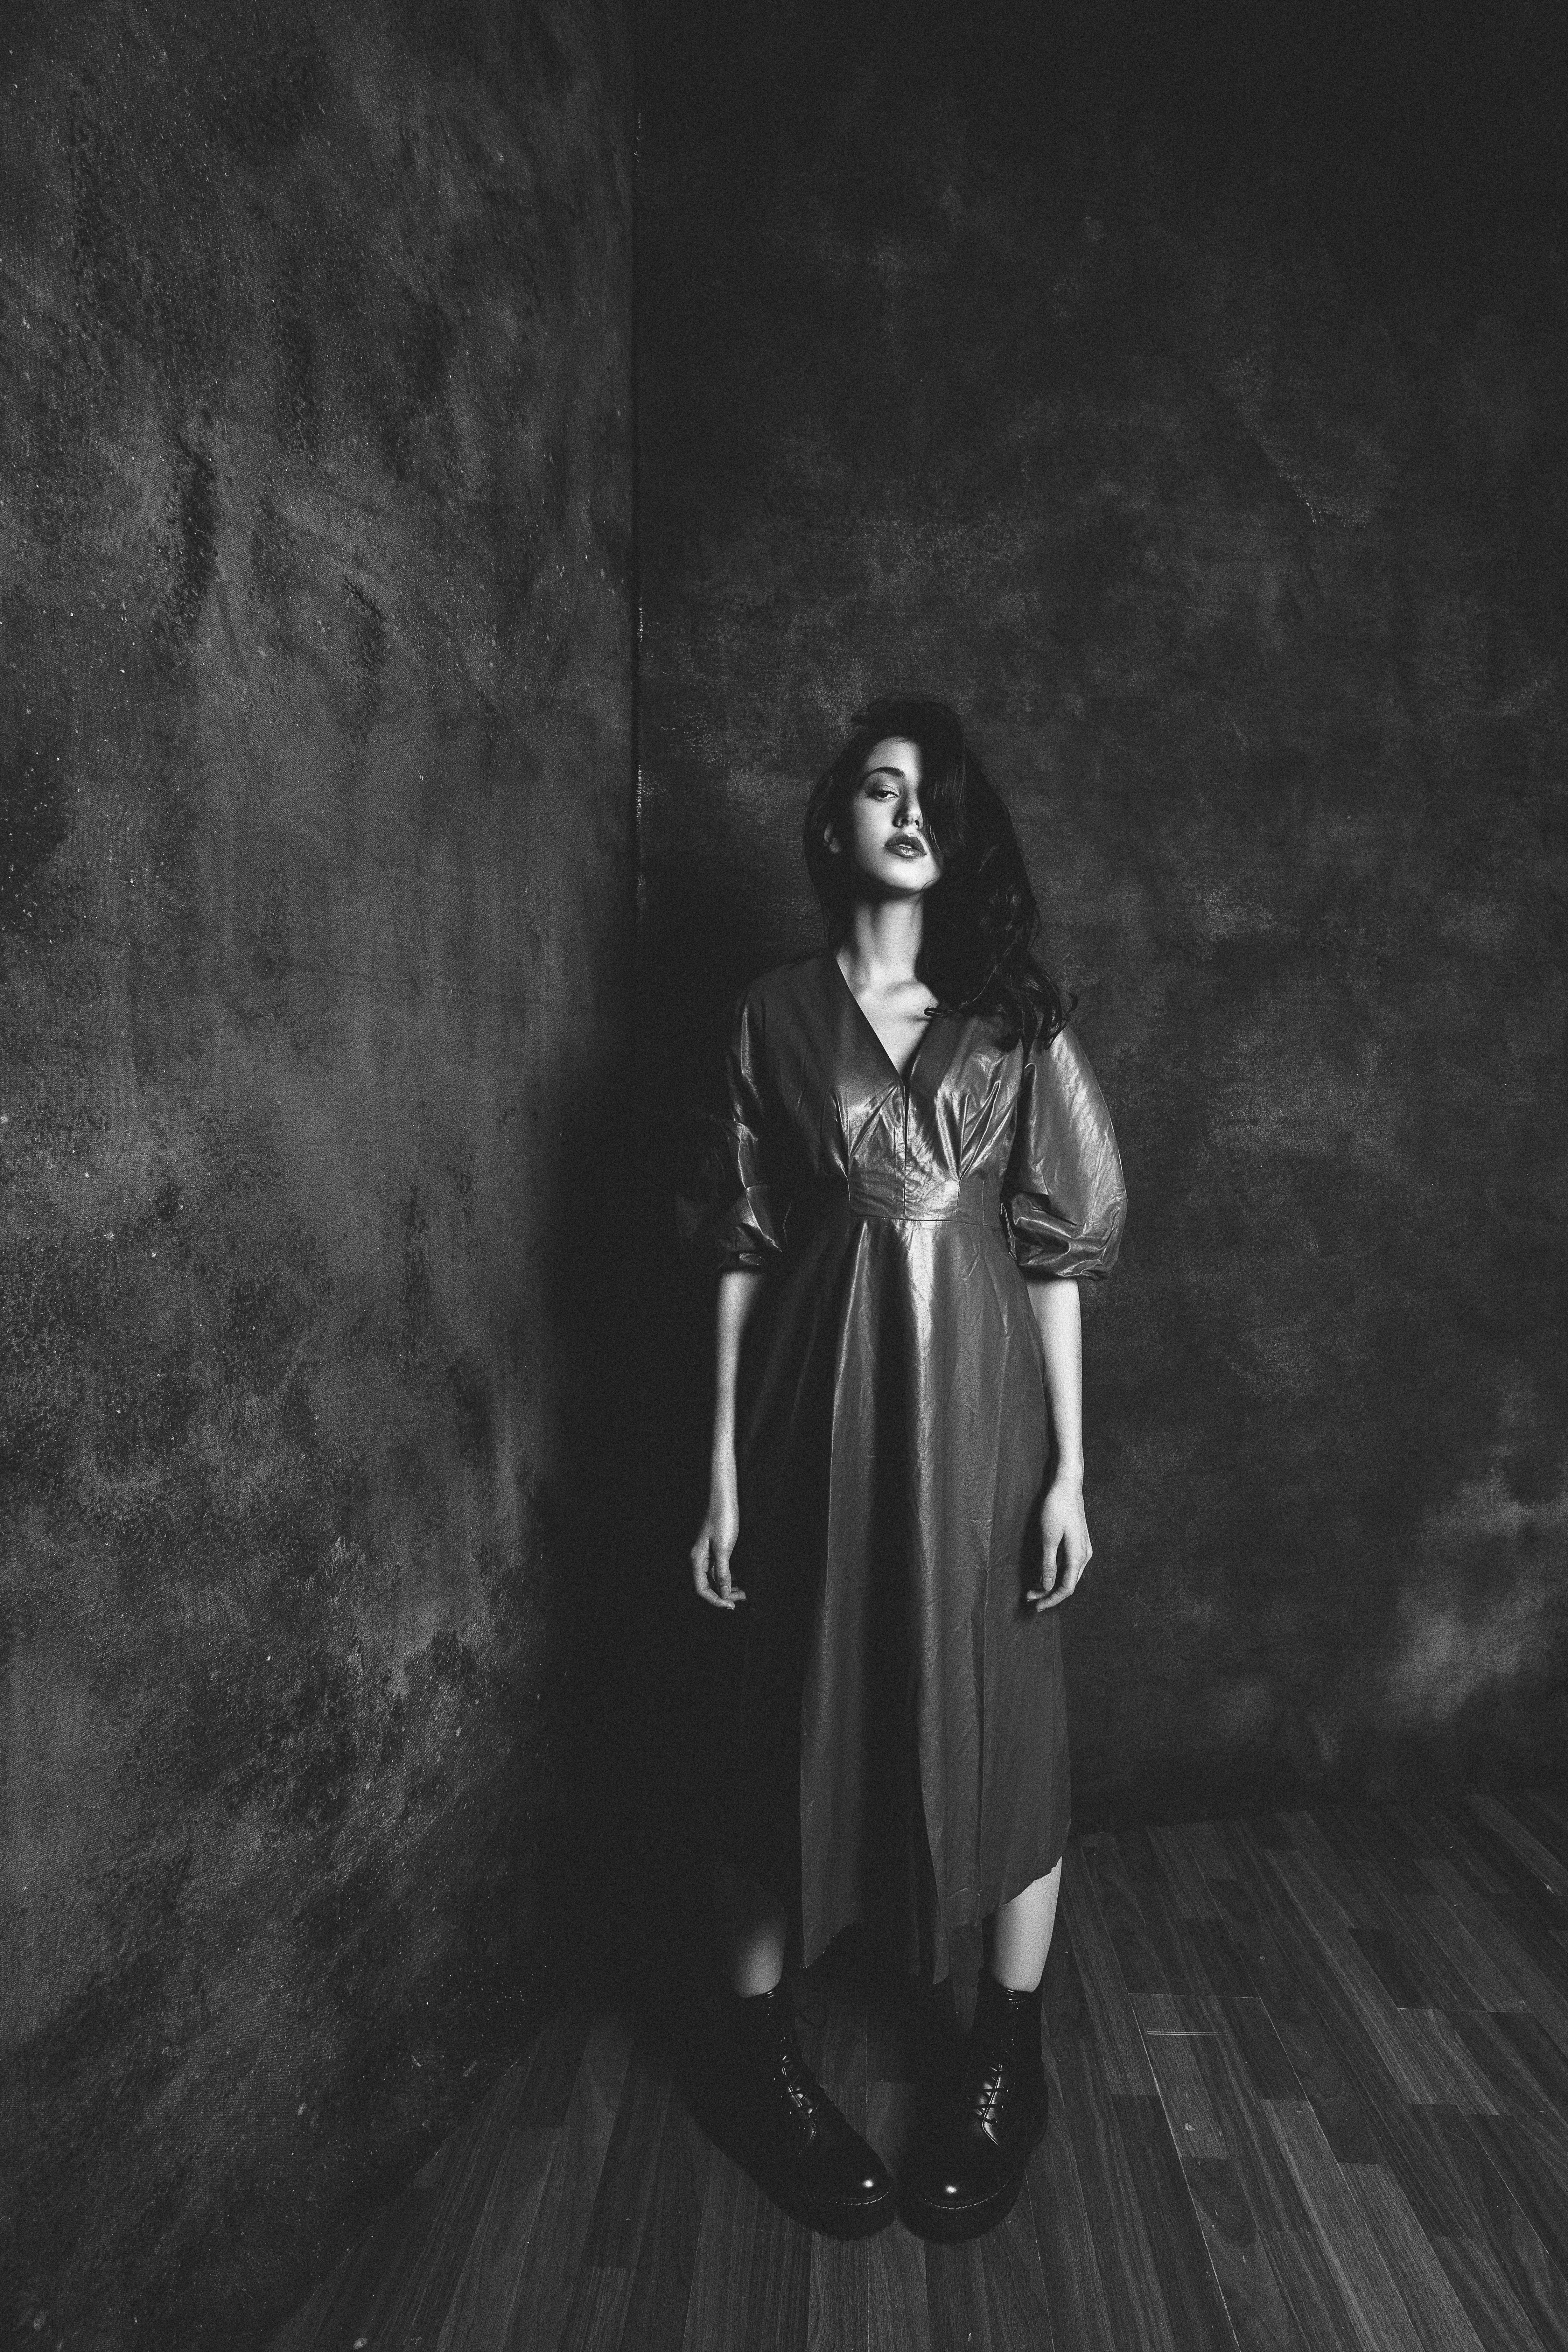 Photo Credit: Oliver Neunteufel - Model: Qendresa B. - Agentur: 1st Place Models - Hair + Make-up: by me